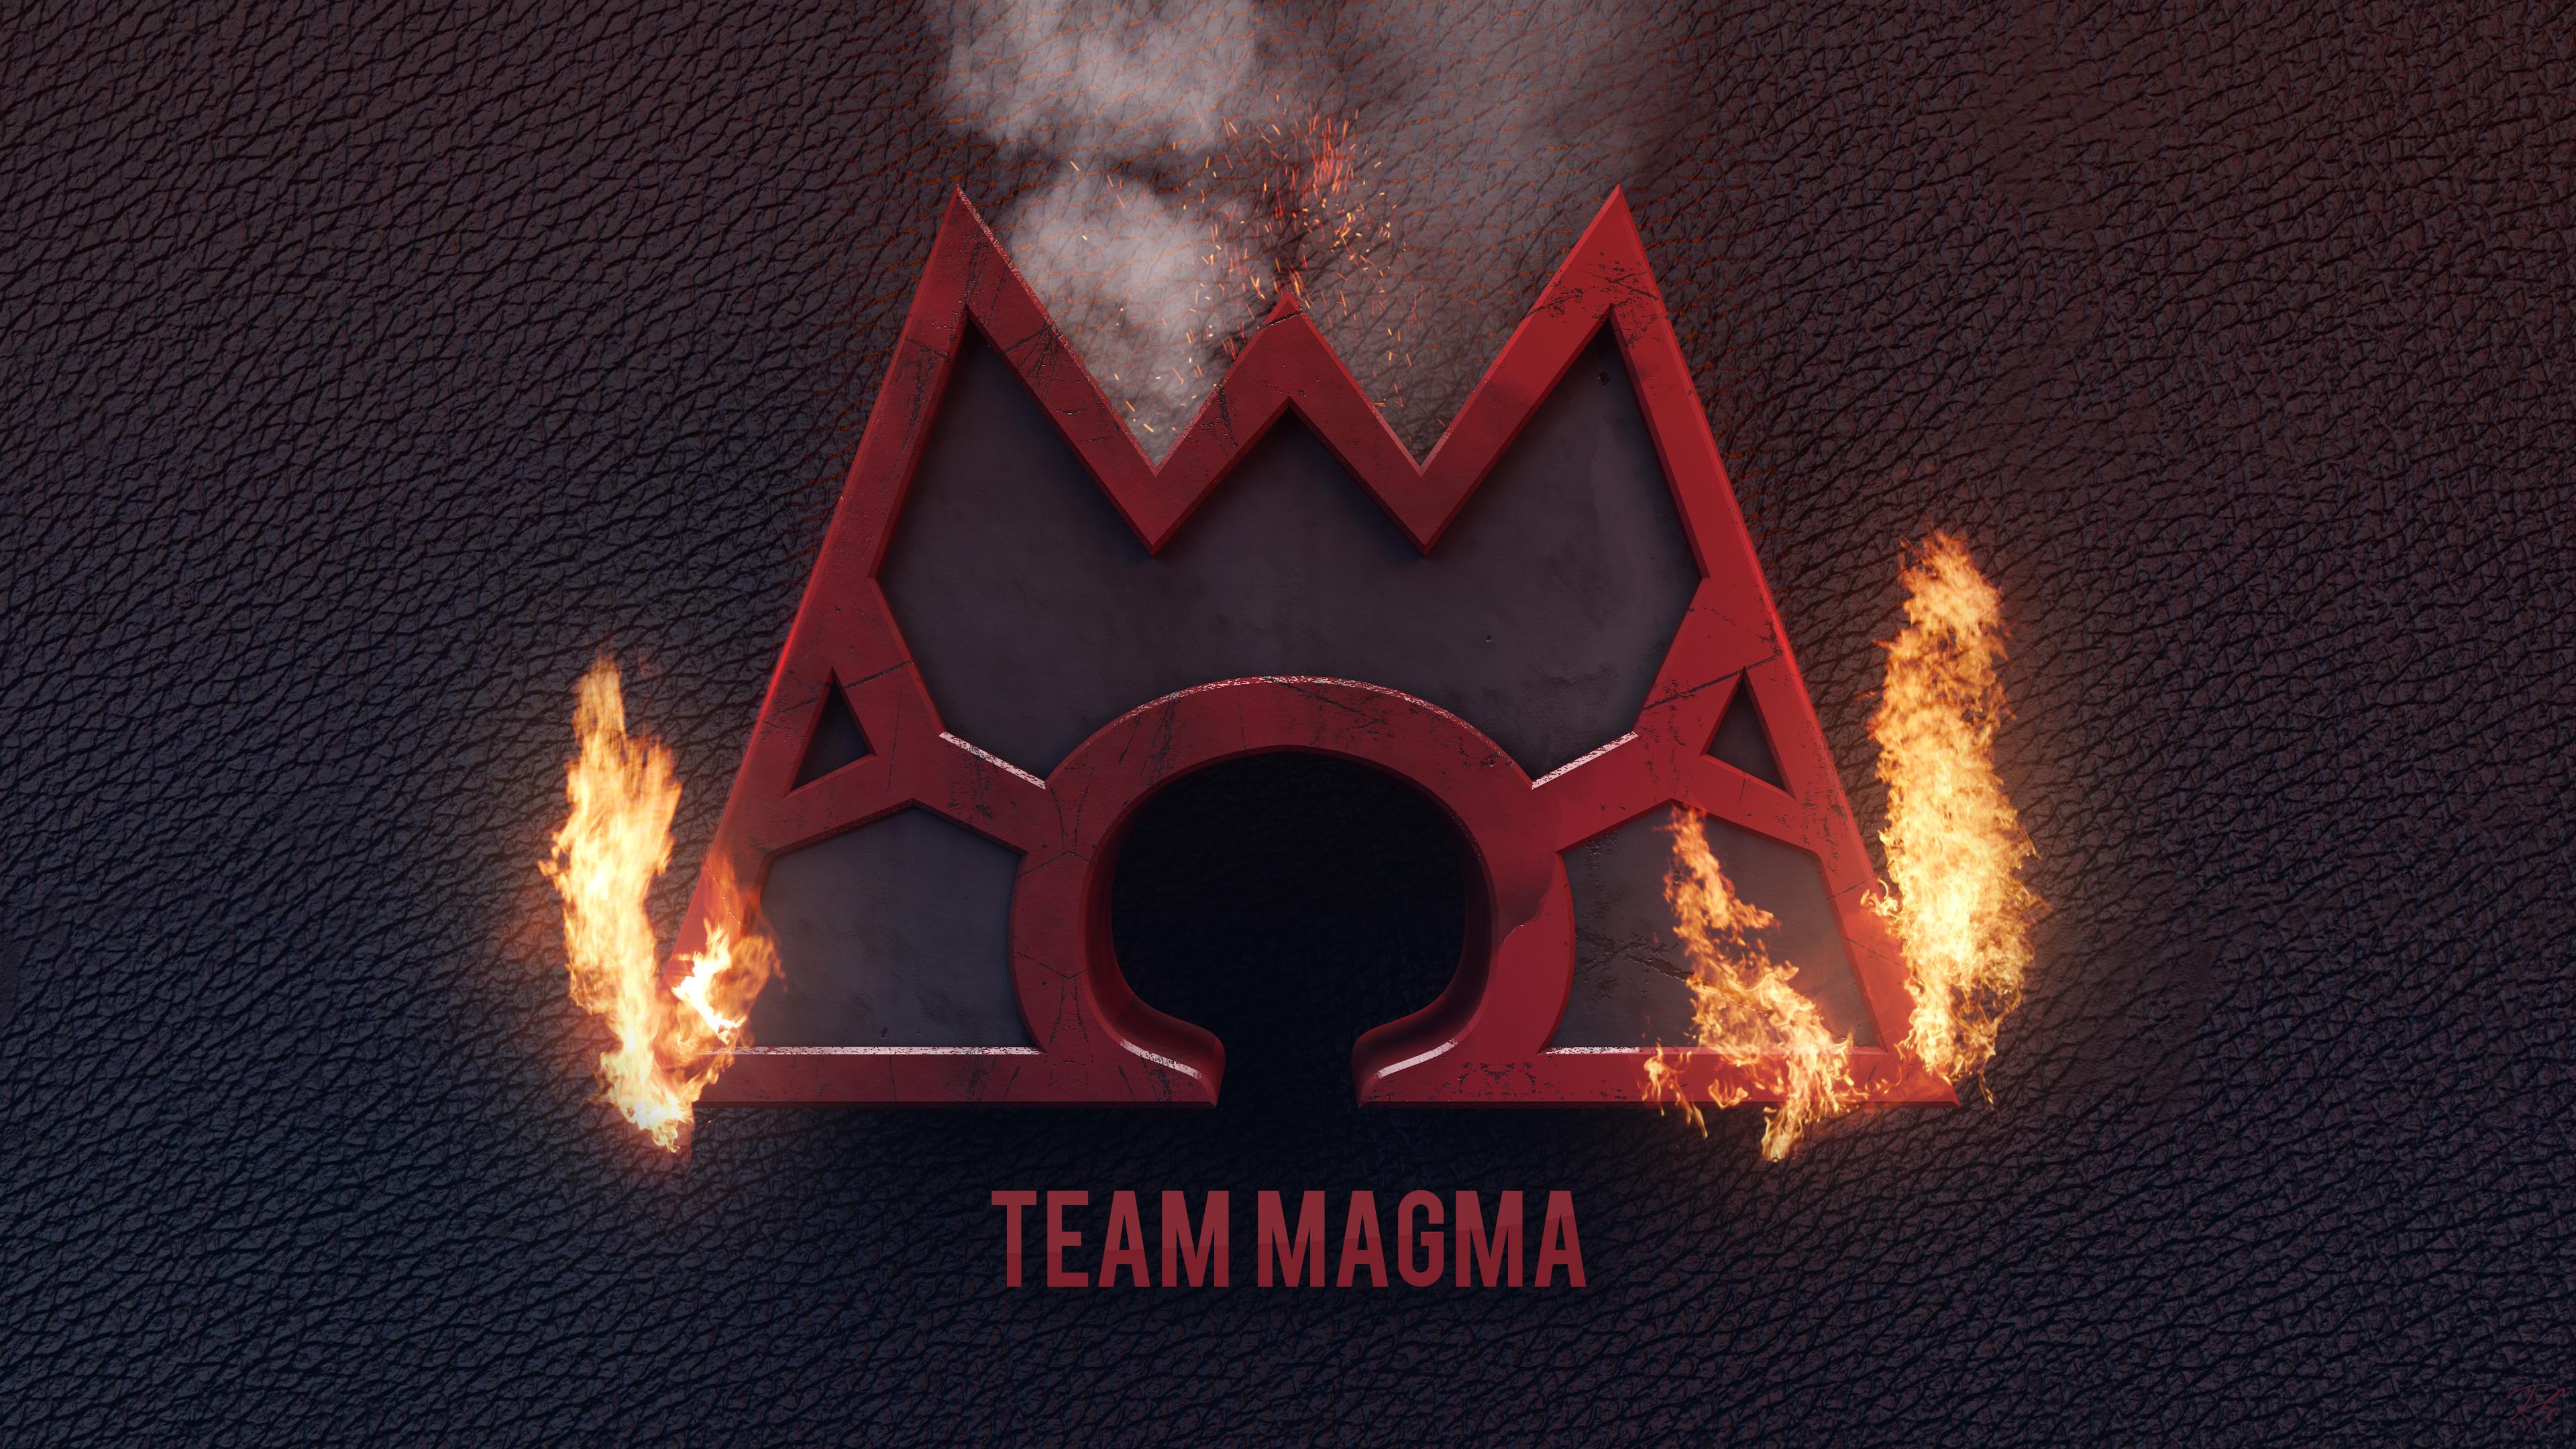 Pokemon Team Magma Logo Team magma 4k wallpaper byTeam Aqua Wallpaper